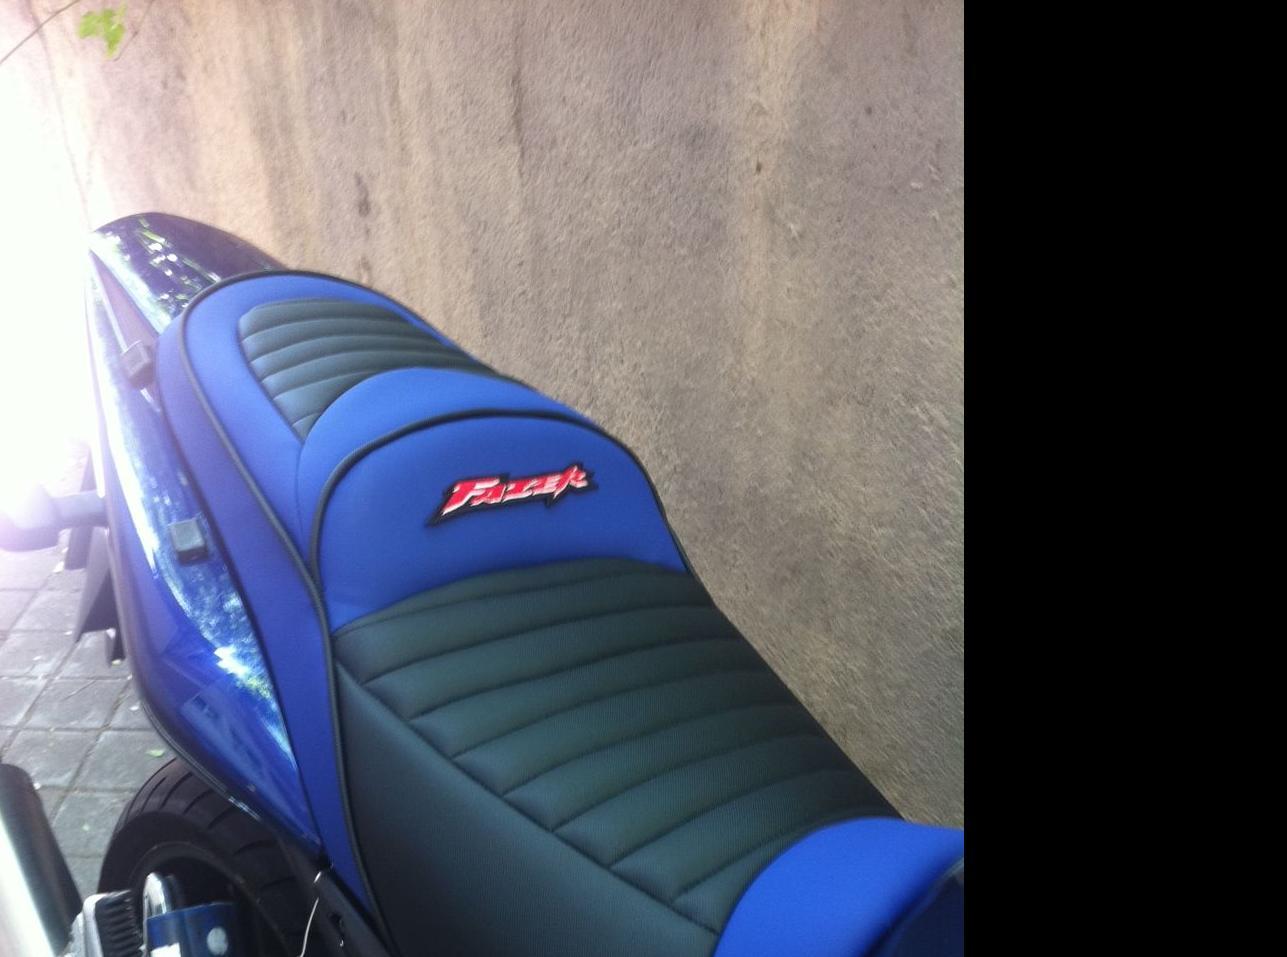 Silla de moto tapizada